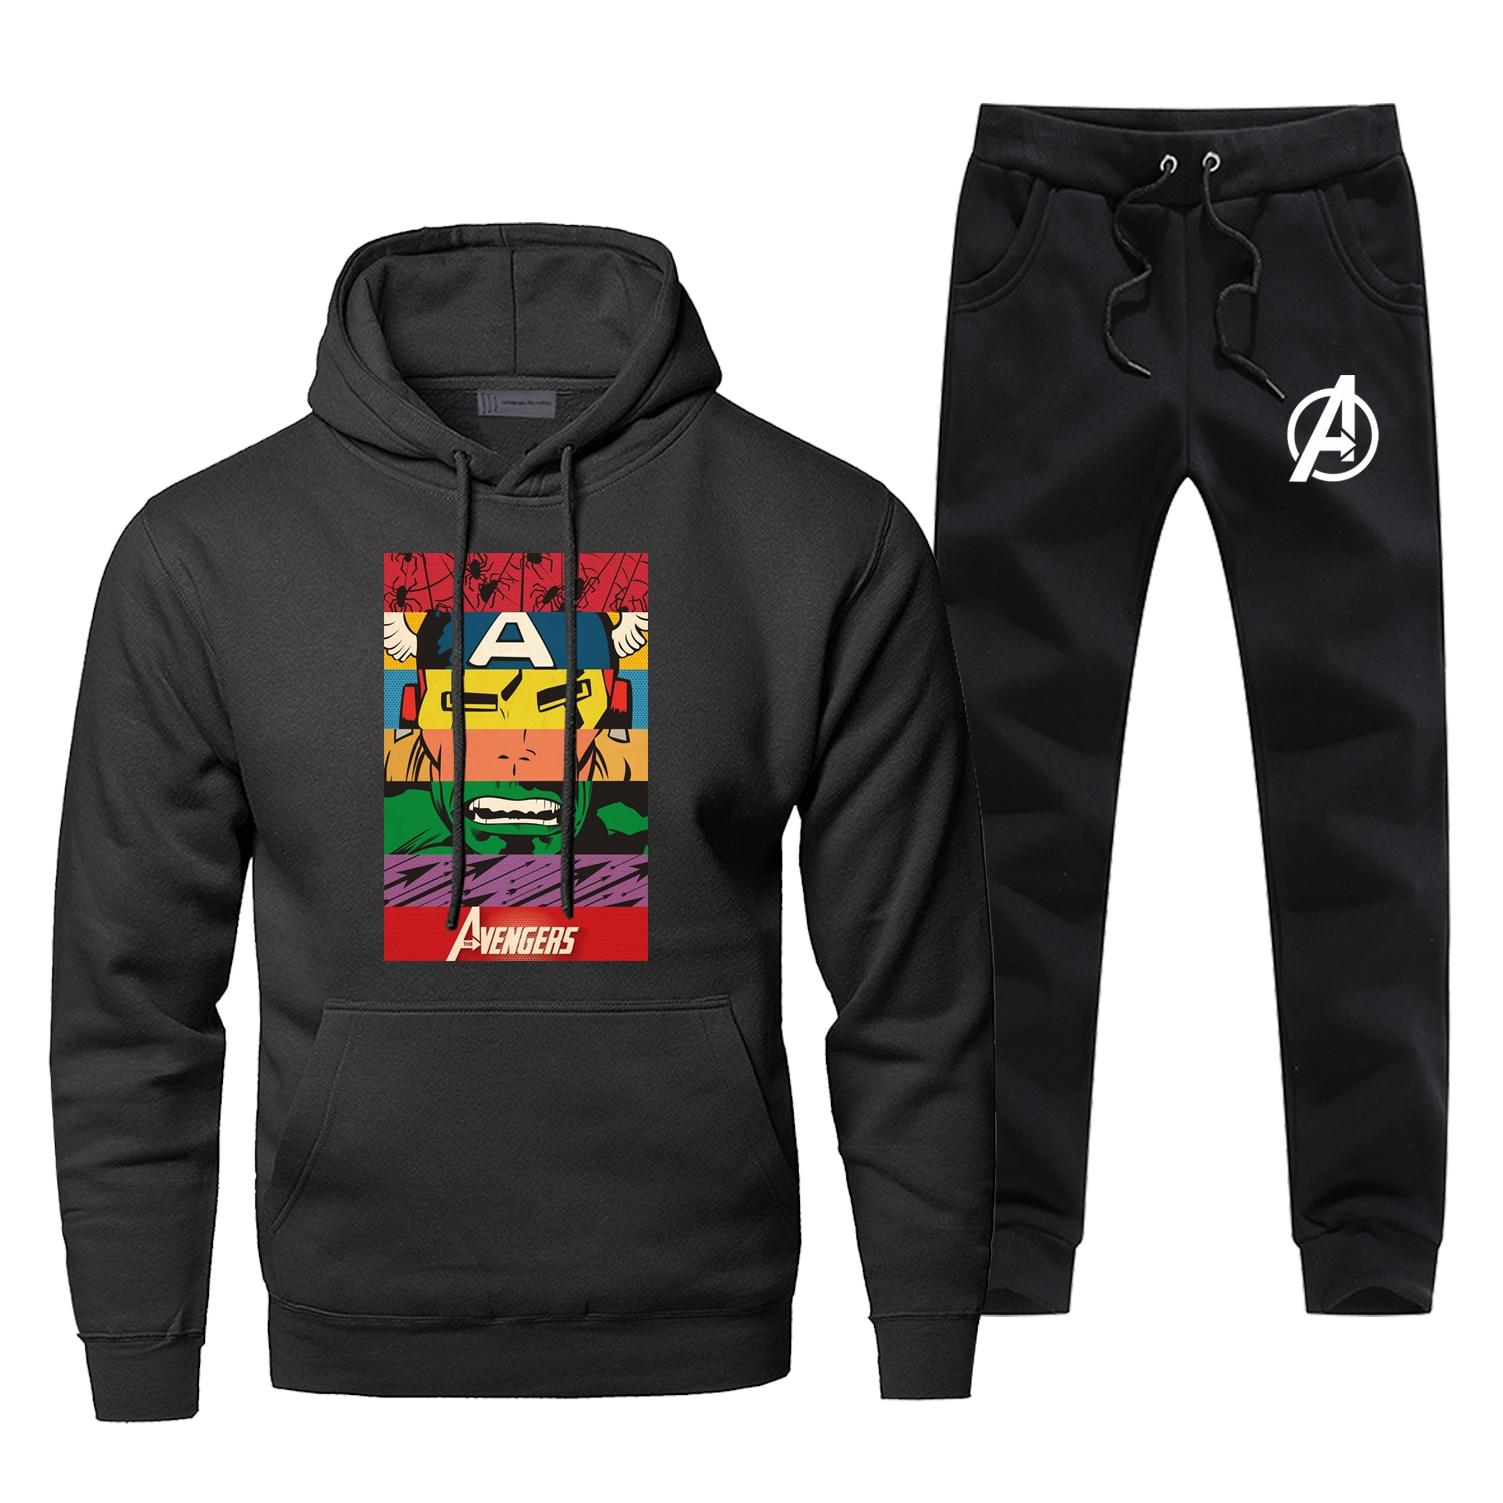 Marvel Movie Avengers Superhero Sweatshirts Mens Avenger Face Printed Hoodies+pants Sets Men Sportswear Harajuku Streetwear